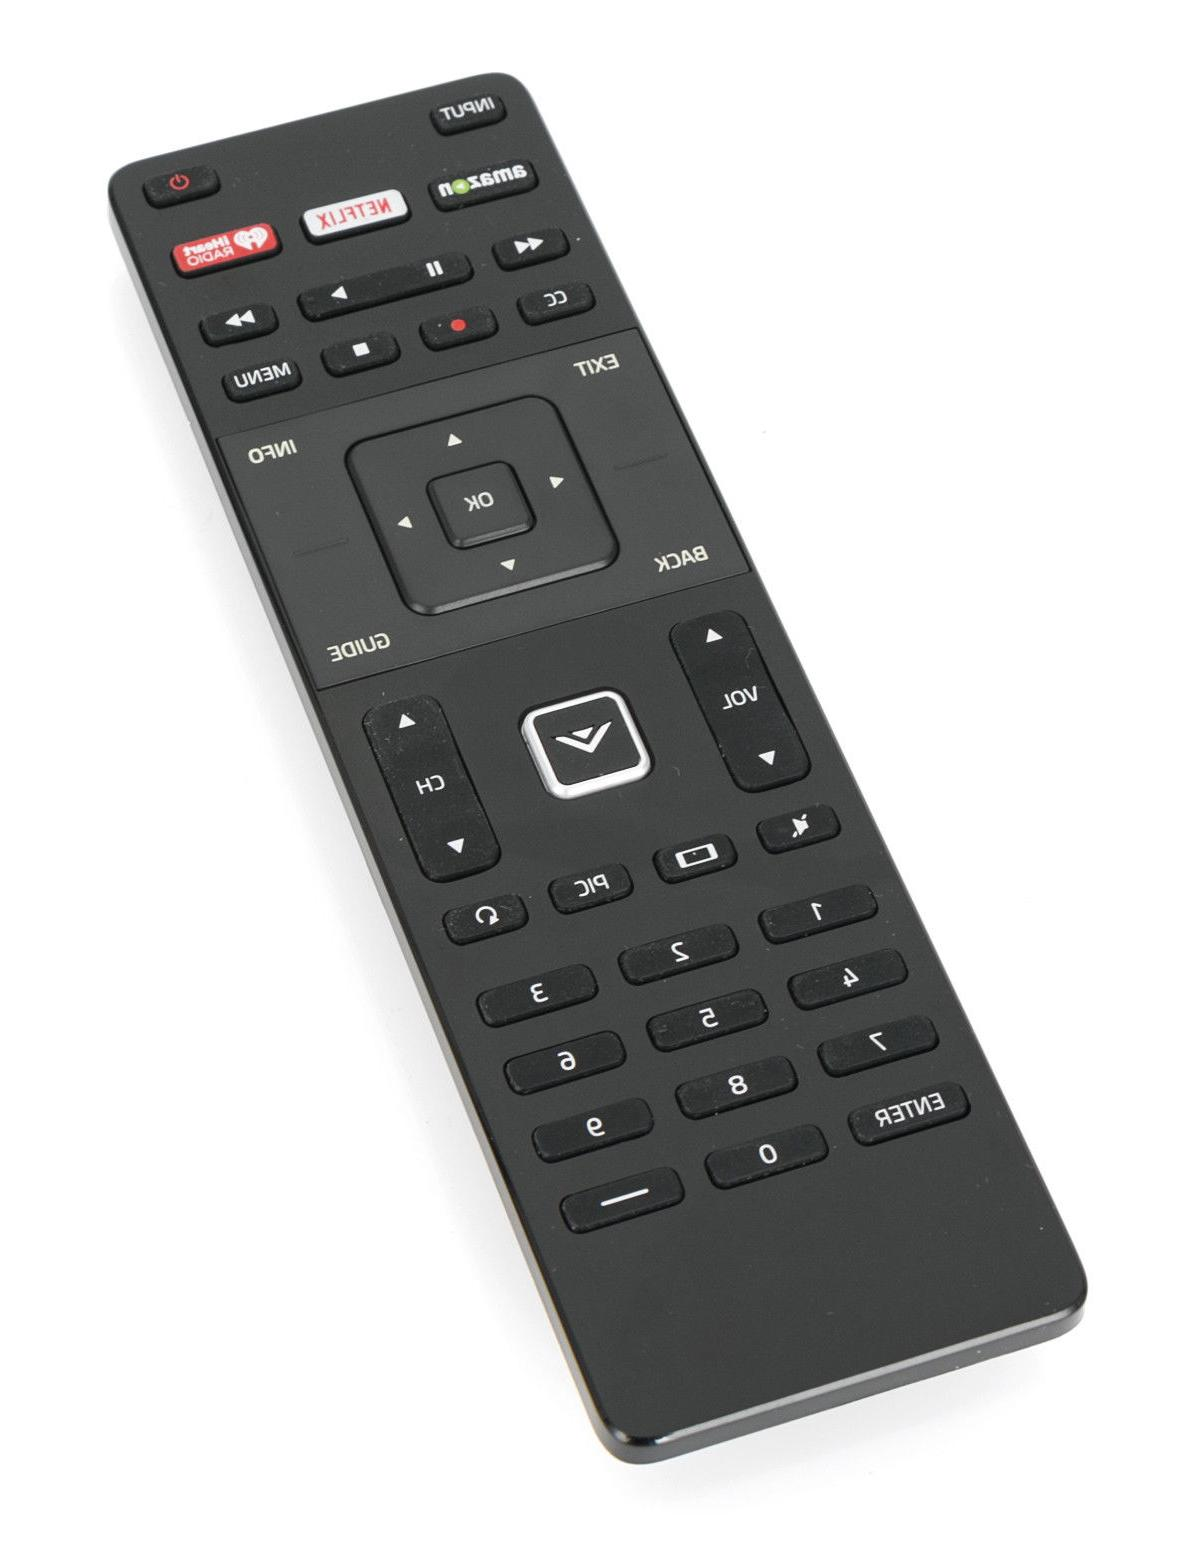 New Remote for Vizio TV D55U-D1 E40-C2 D43-D1